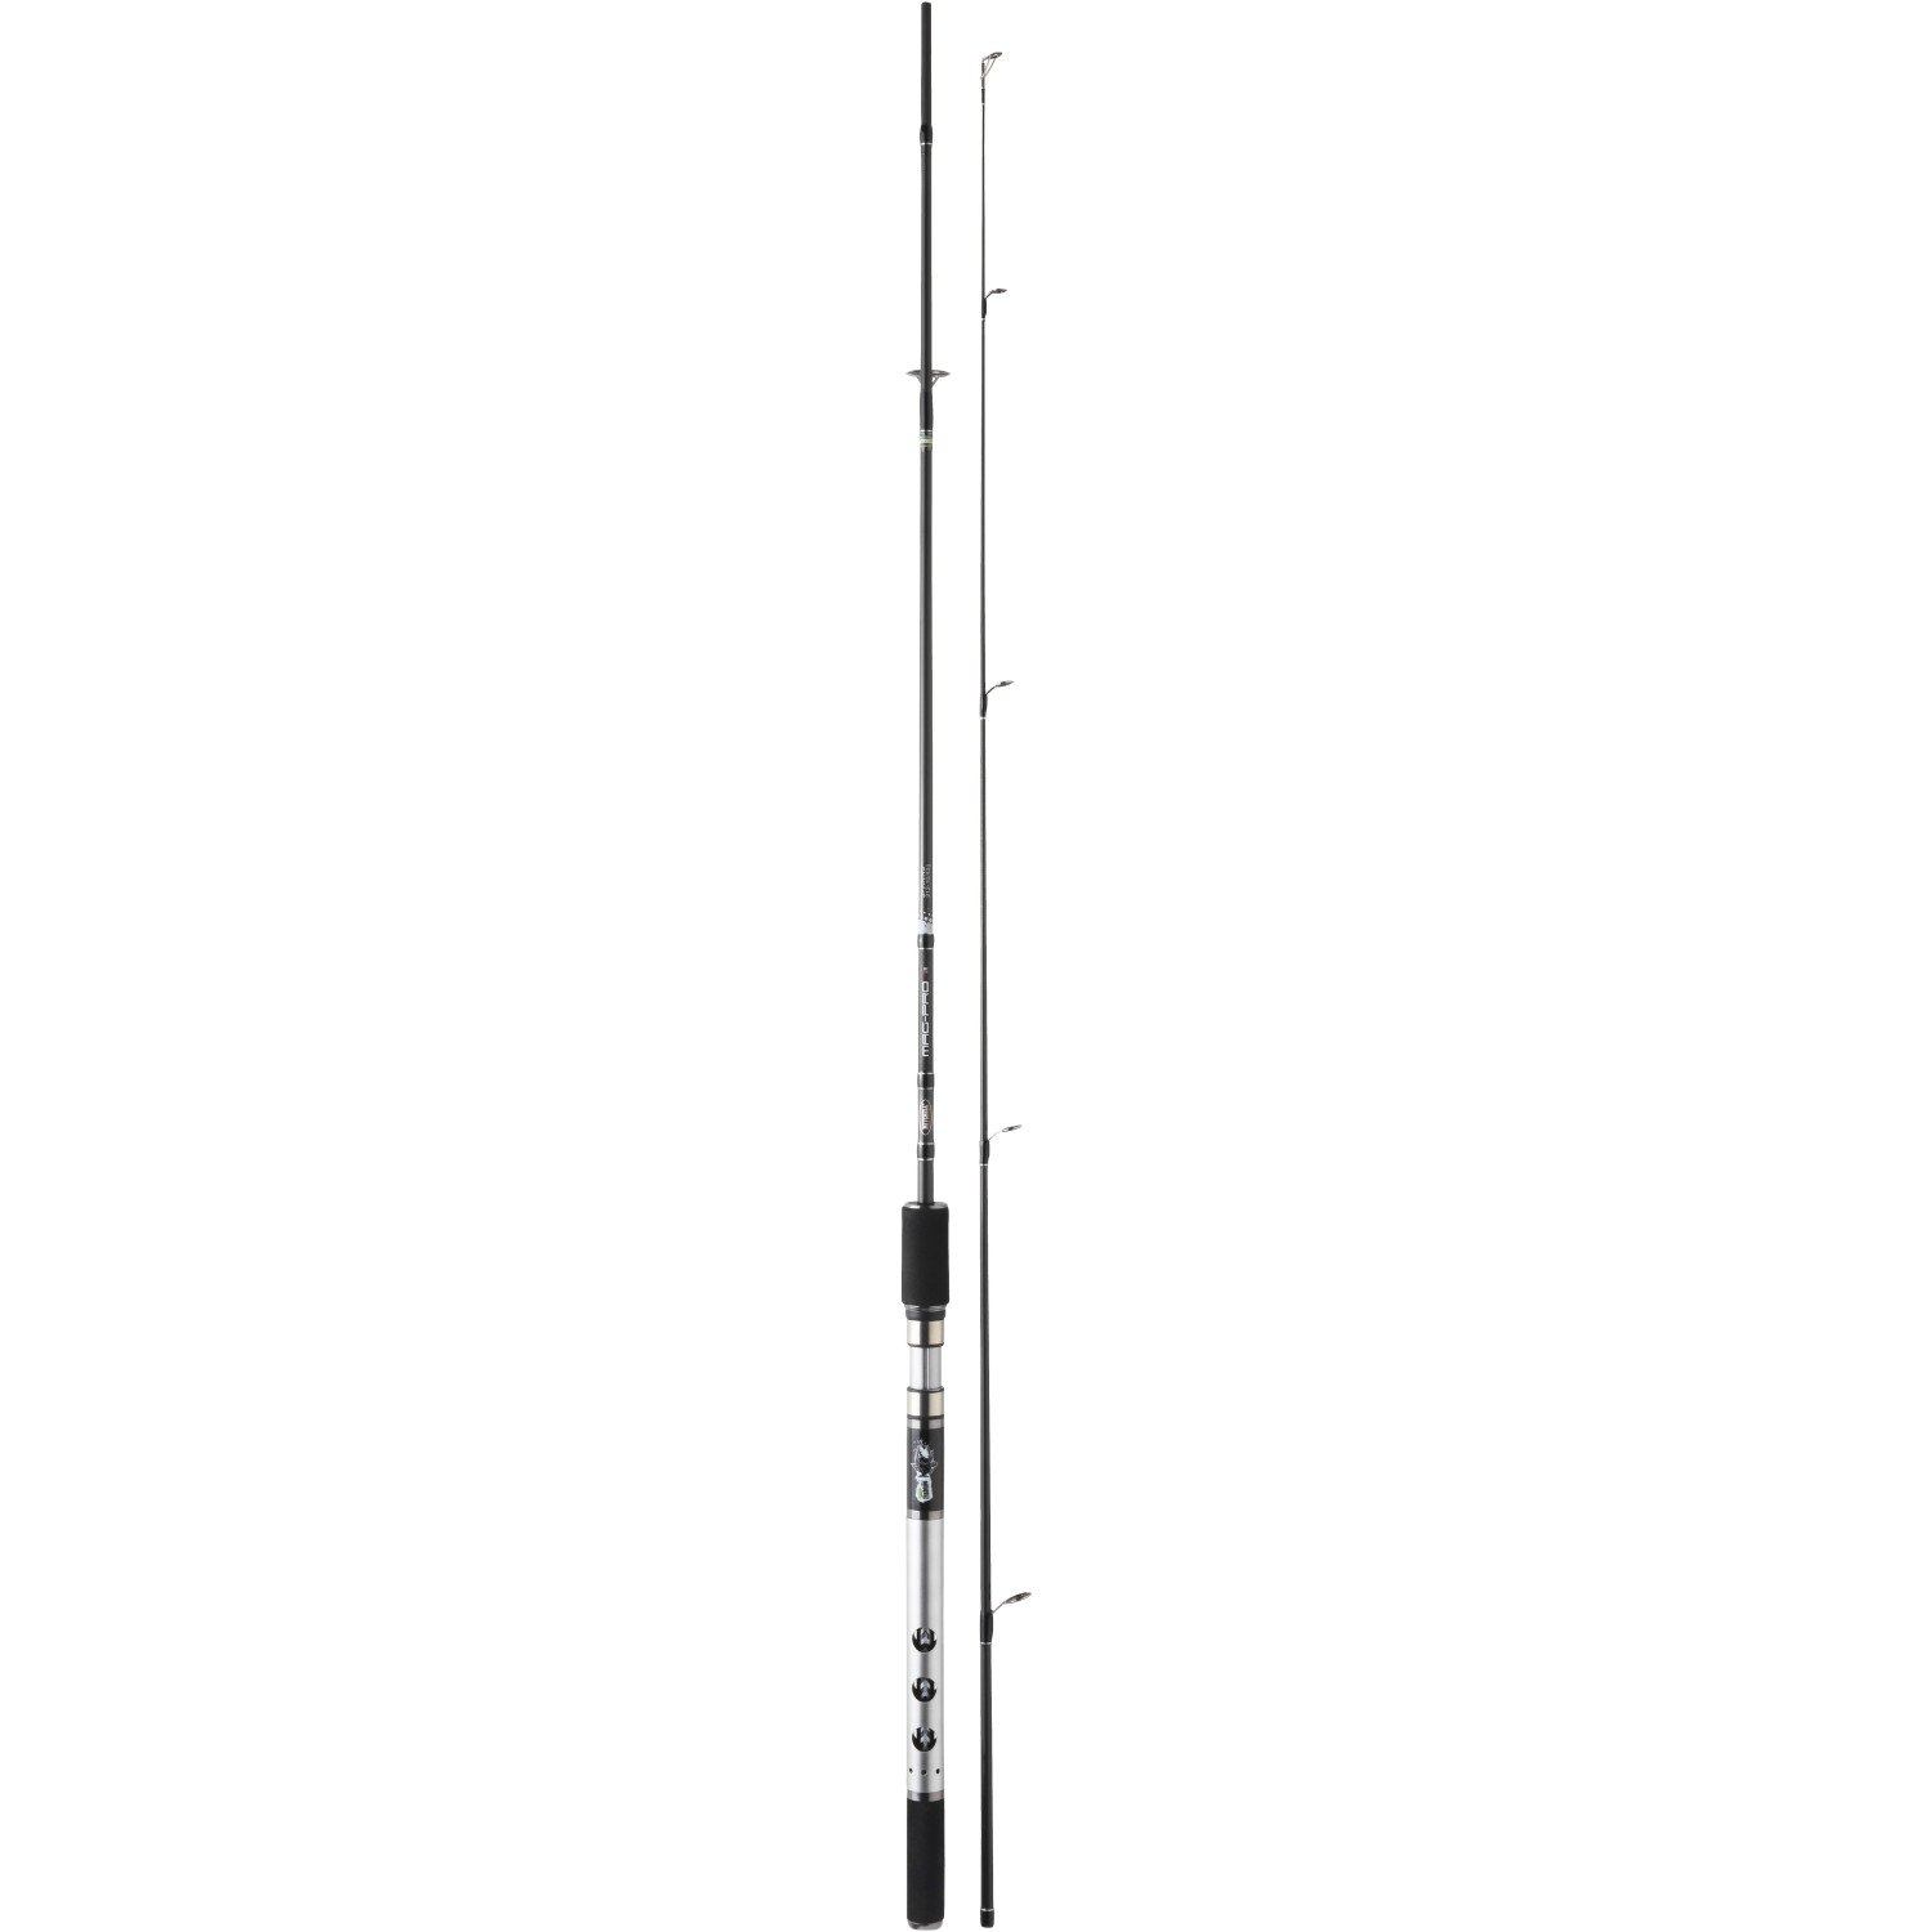 Mag Pro Elite - Spin 2.40m, 20 - 60g